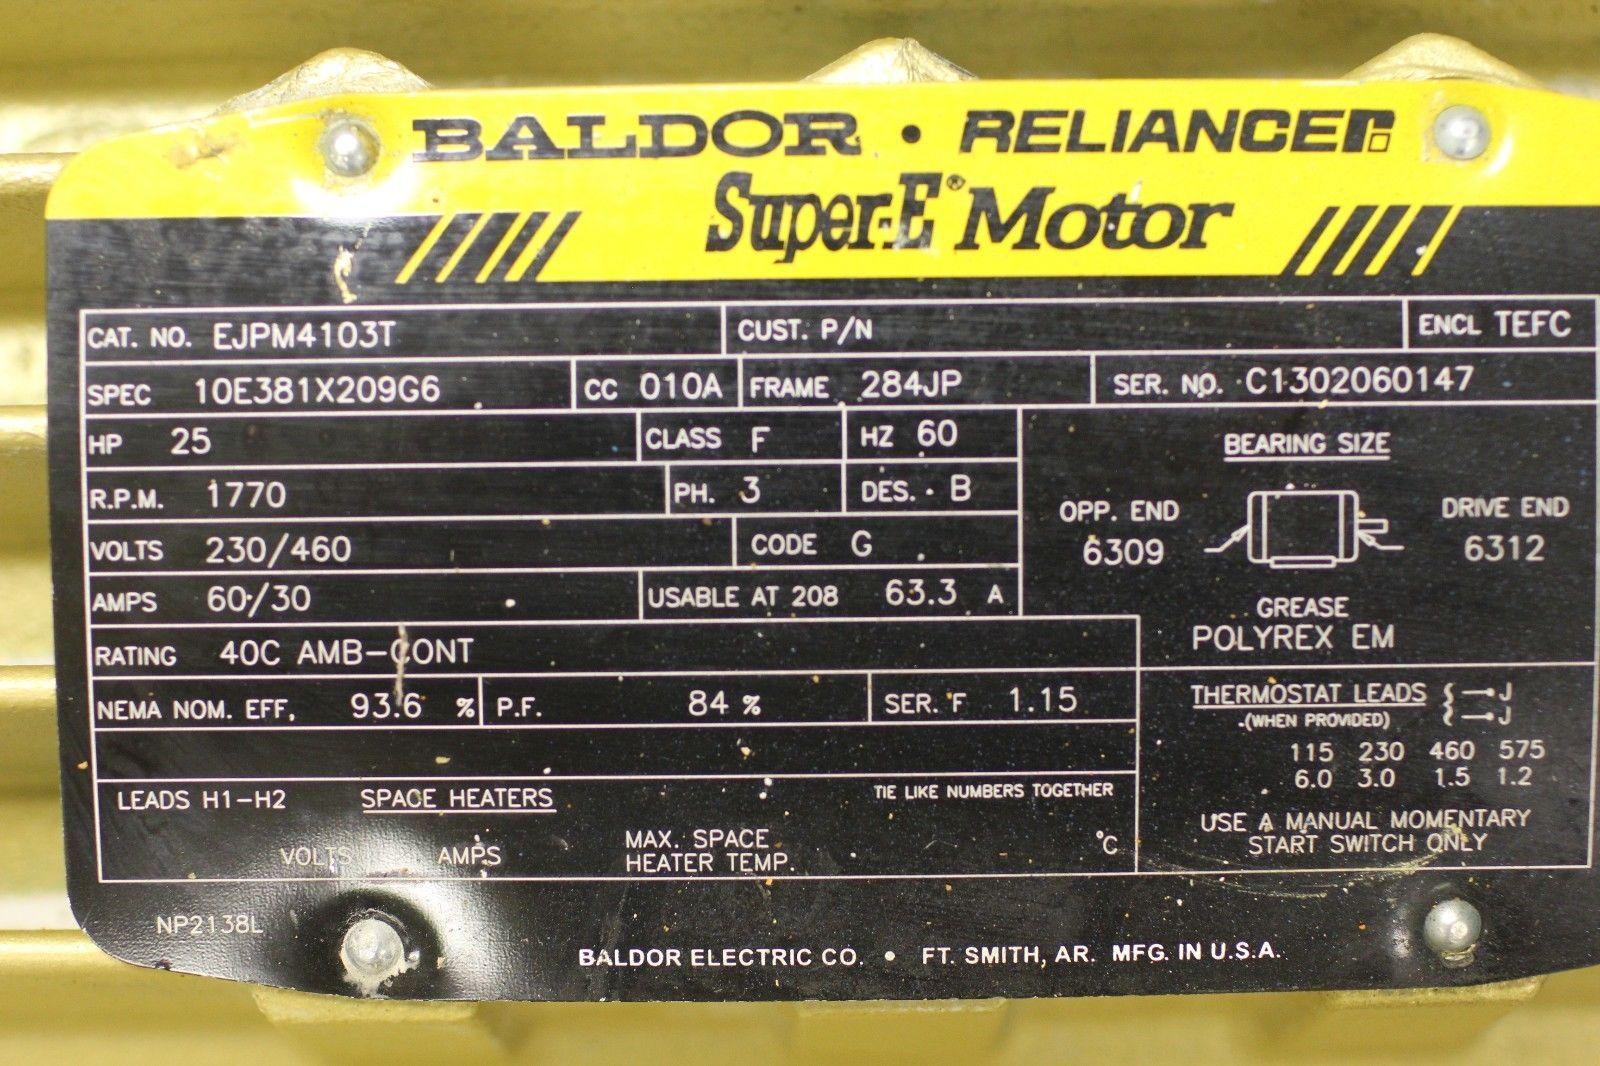 Used baldor reliance super e motor ejpm4103t 25 hp for Baldor reliance super e motor